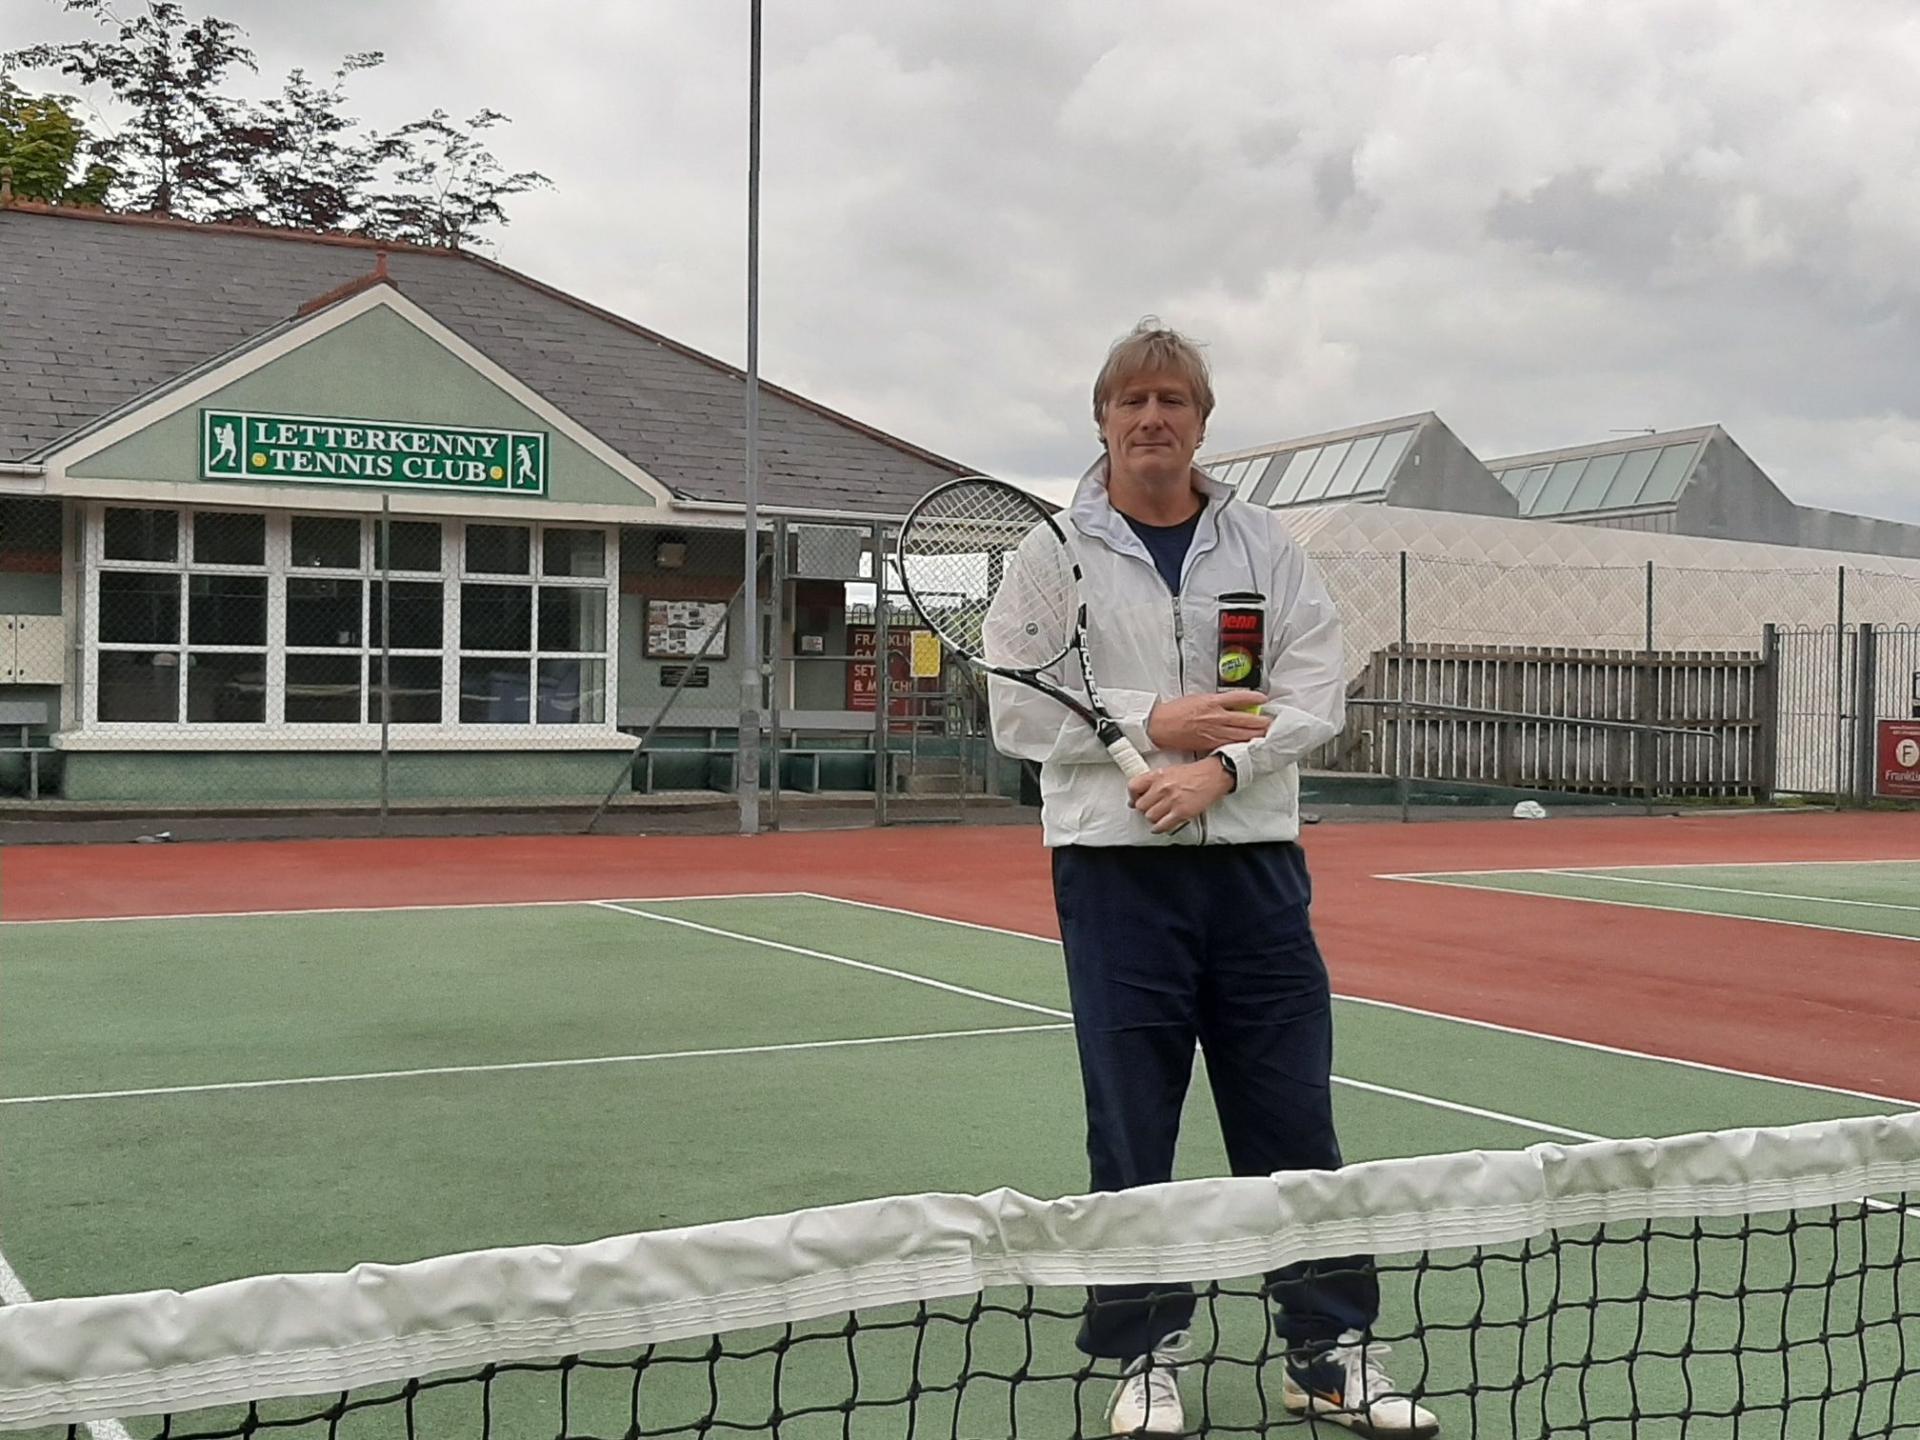 Gerry Clarke, coach at Letterkenny Tennis Club